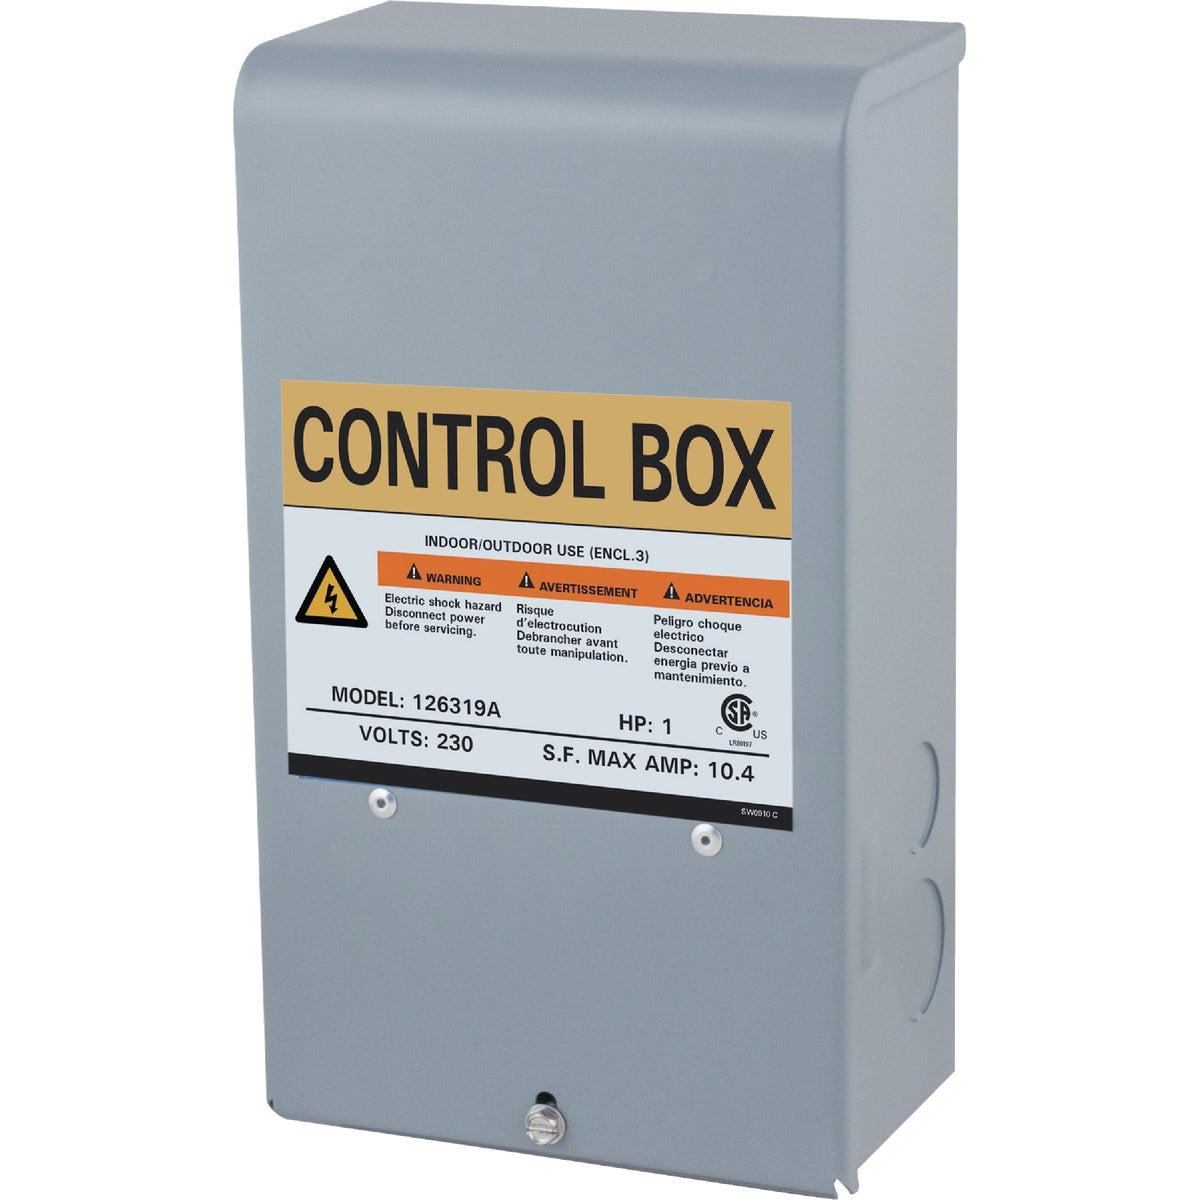 Flint Walling/Star 1HP 230V CONTROL 126319